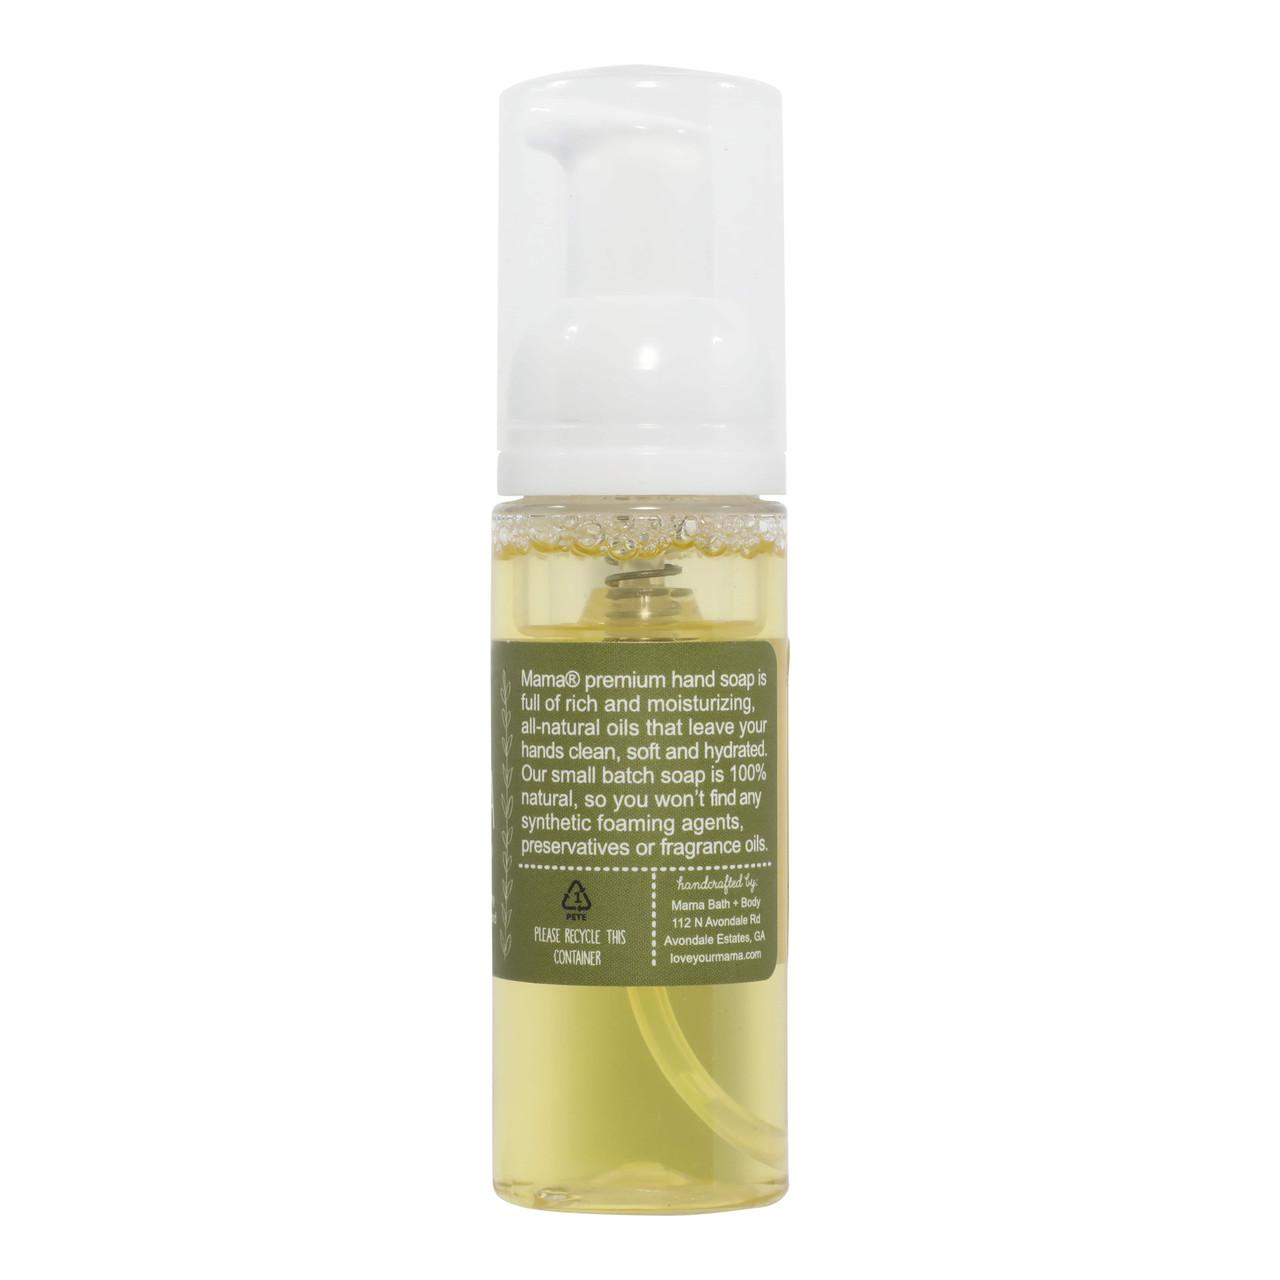 Karma (Patchouli + Rosemary) Travel Size Liquid Soap | Mama Bath + Body